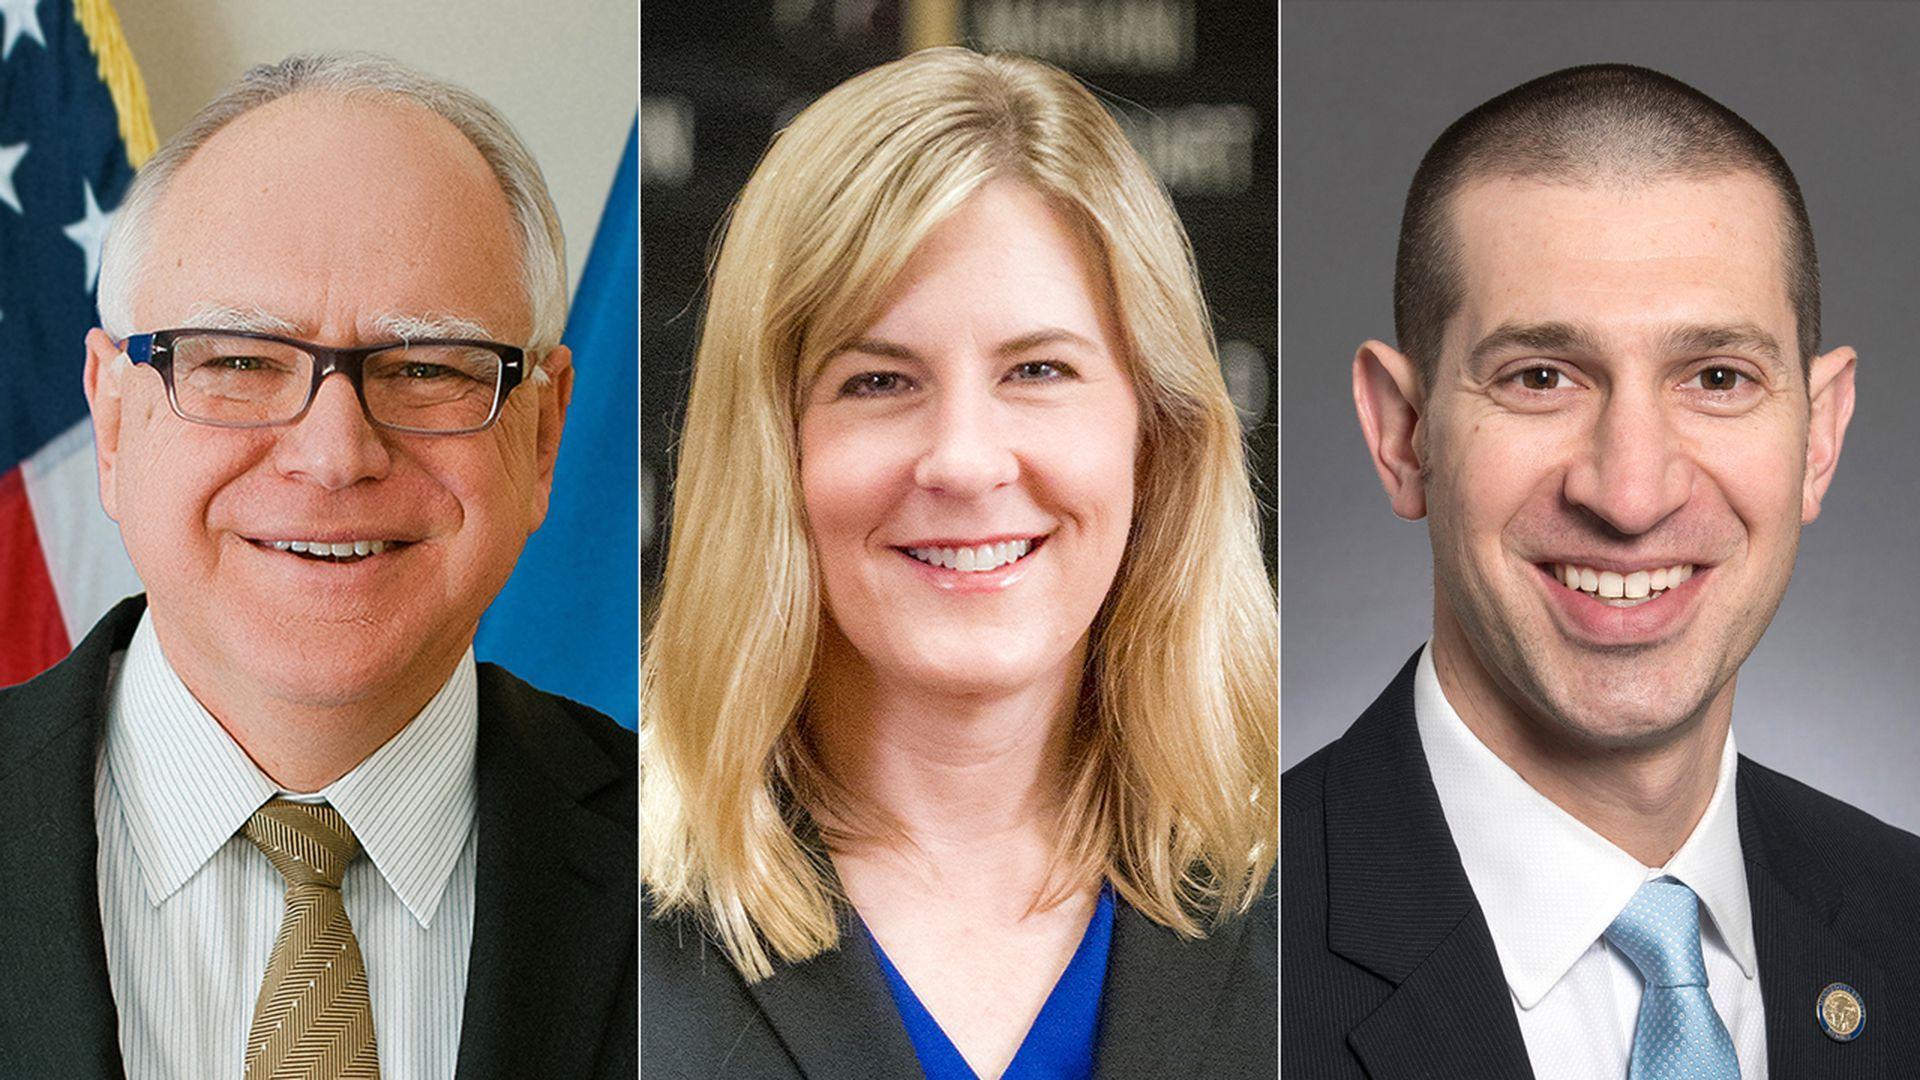 Three side-by-side headshots of Minnesota Gov. Tim Walz, State House Speaker Melissa Hortman and State Senate Majority Leader Jeremy Miller.